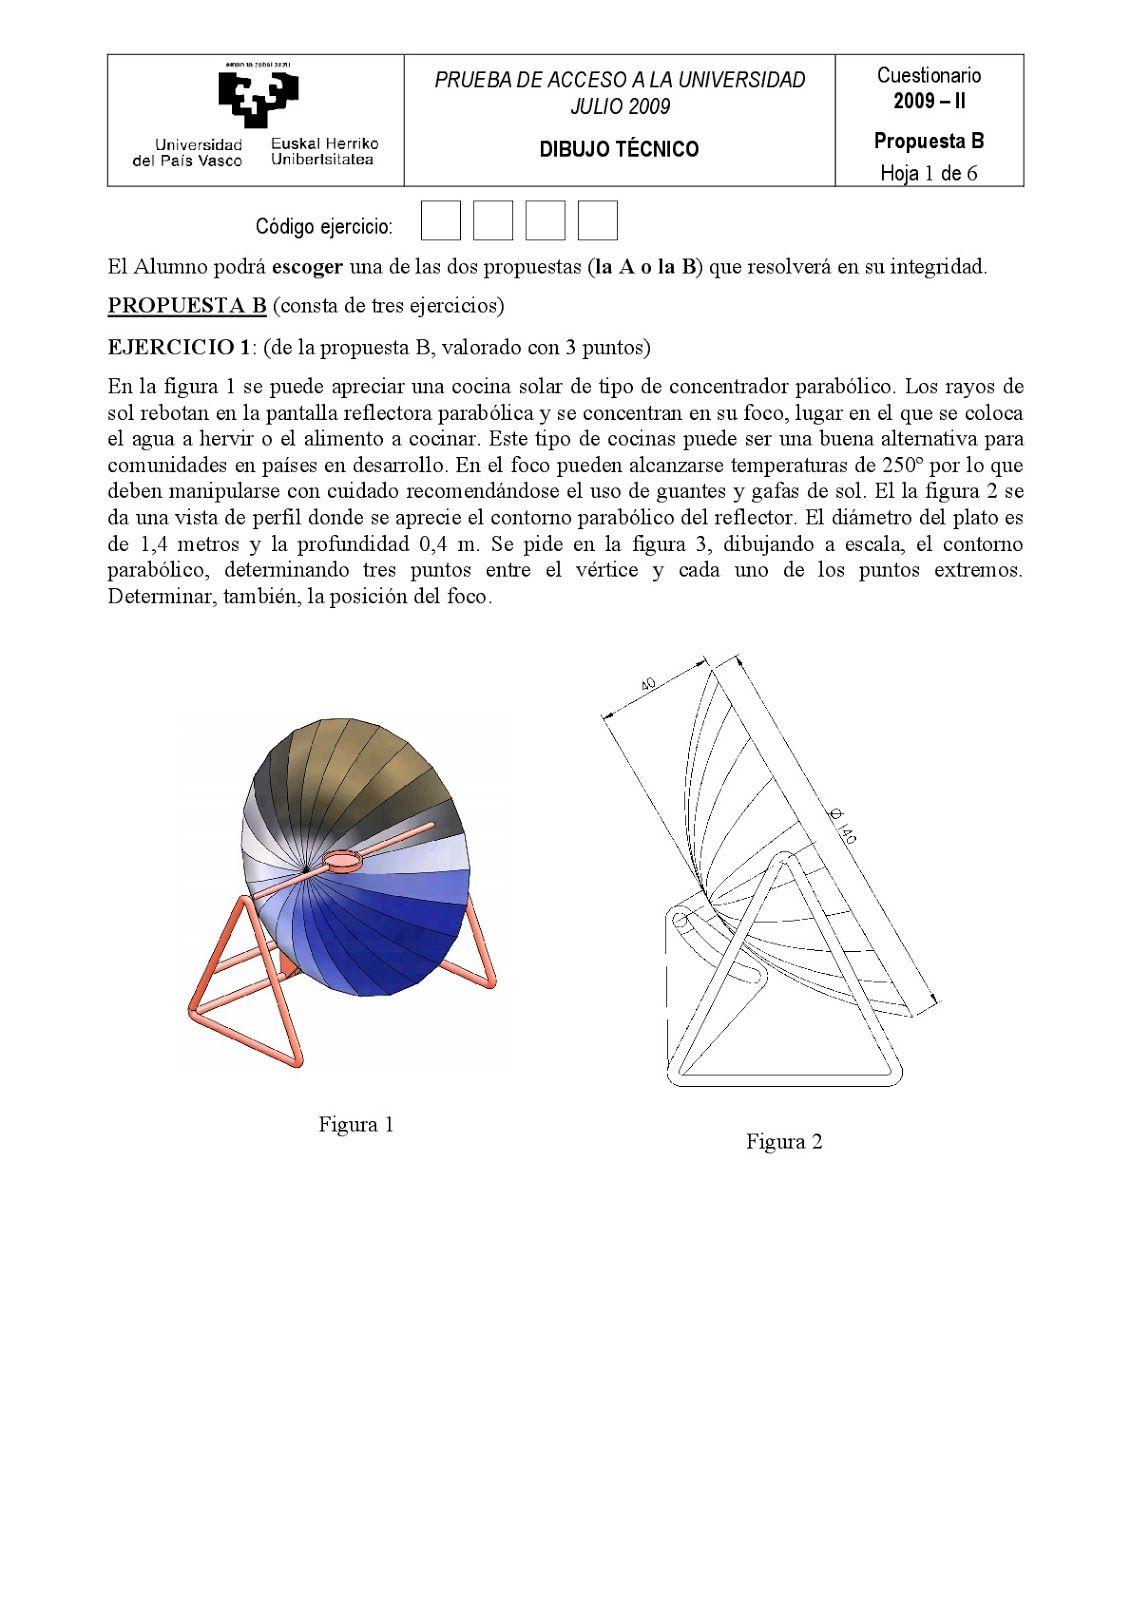 Examenes De Evaluacion Bachillerato Dibujo Tecnico Para El Acceso A La Universidad Ebau 2018 Convocatorias Junio Bachillerato Evaluacion Tecnicas De Dibujo